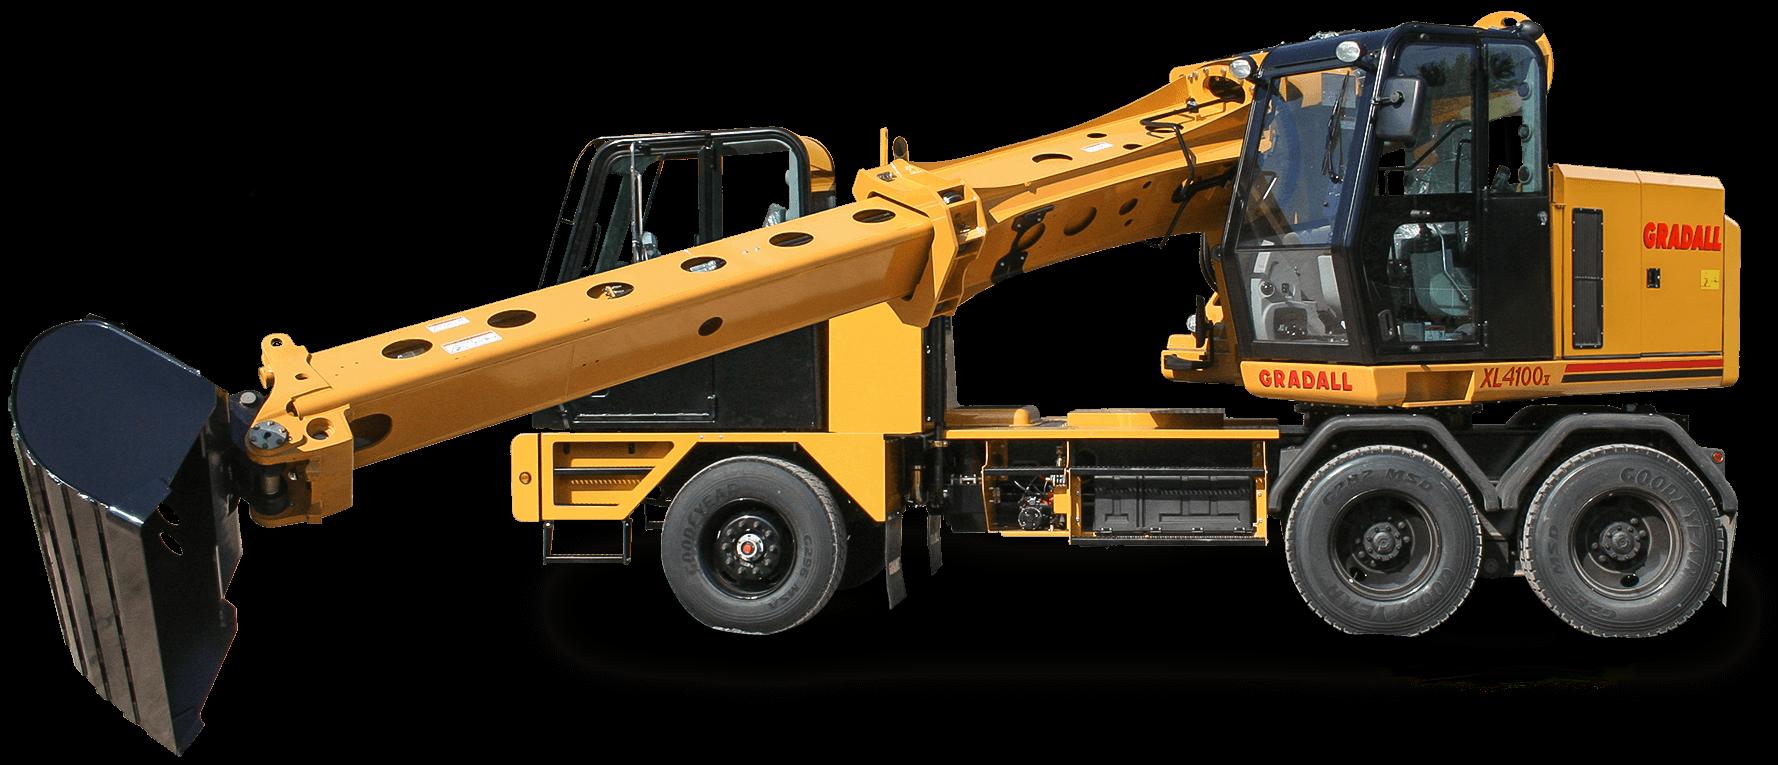 Gradall Wheeled Excavator